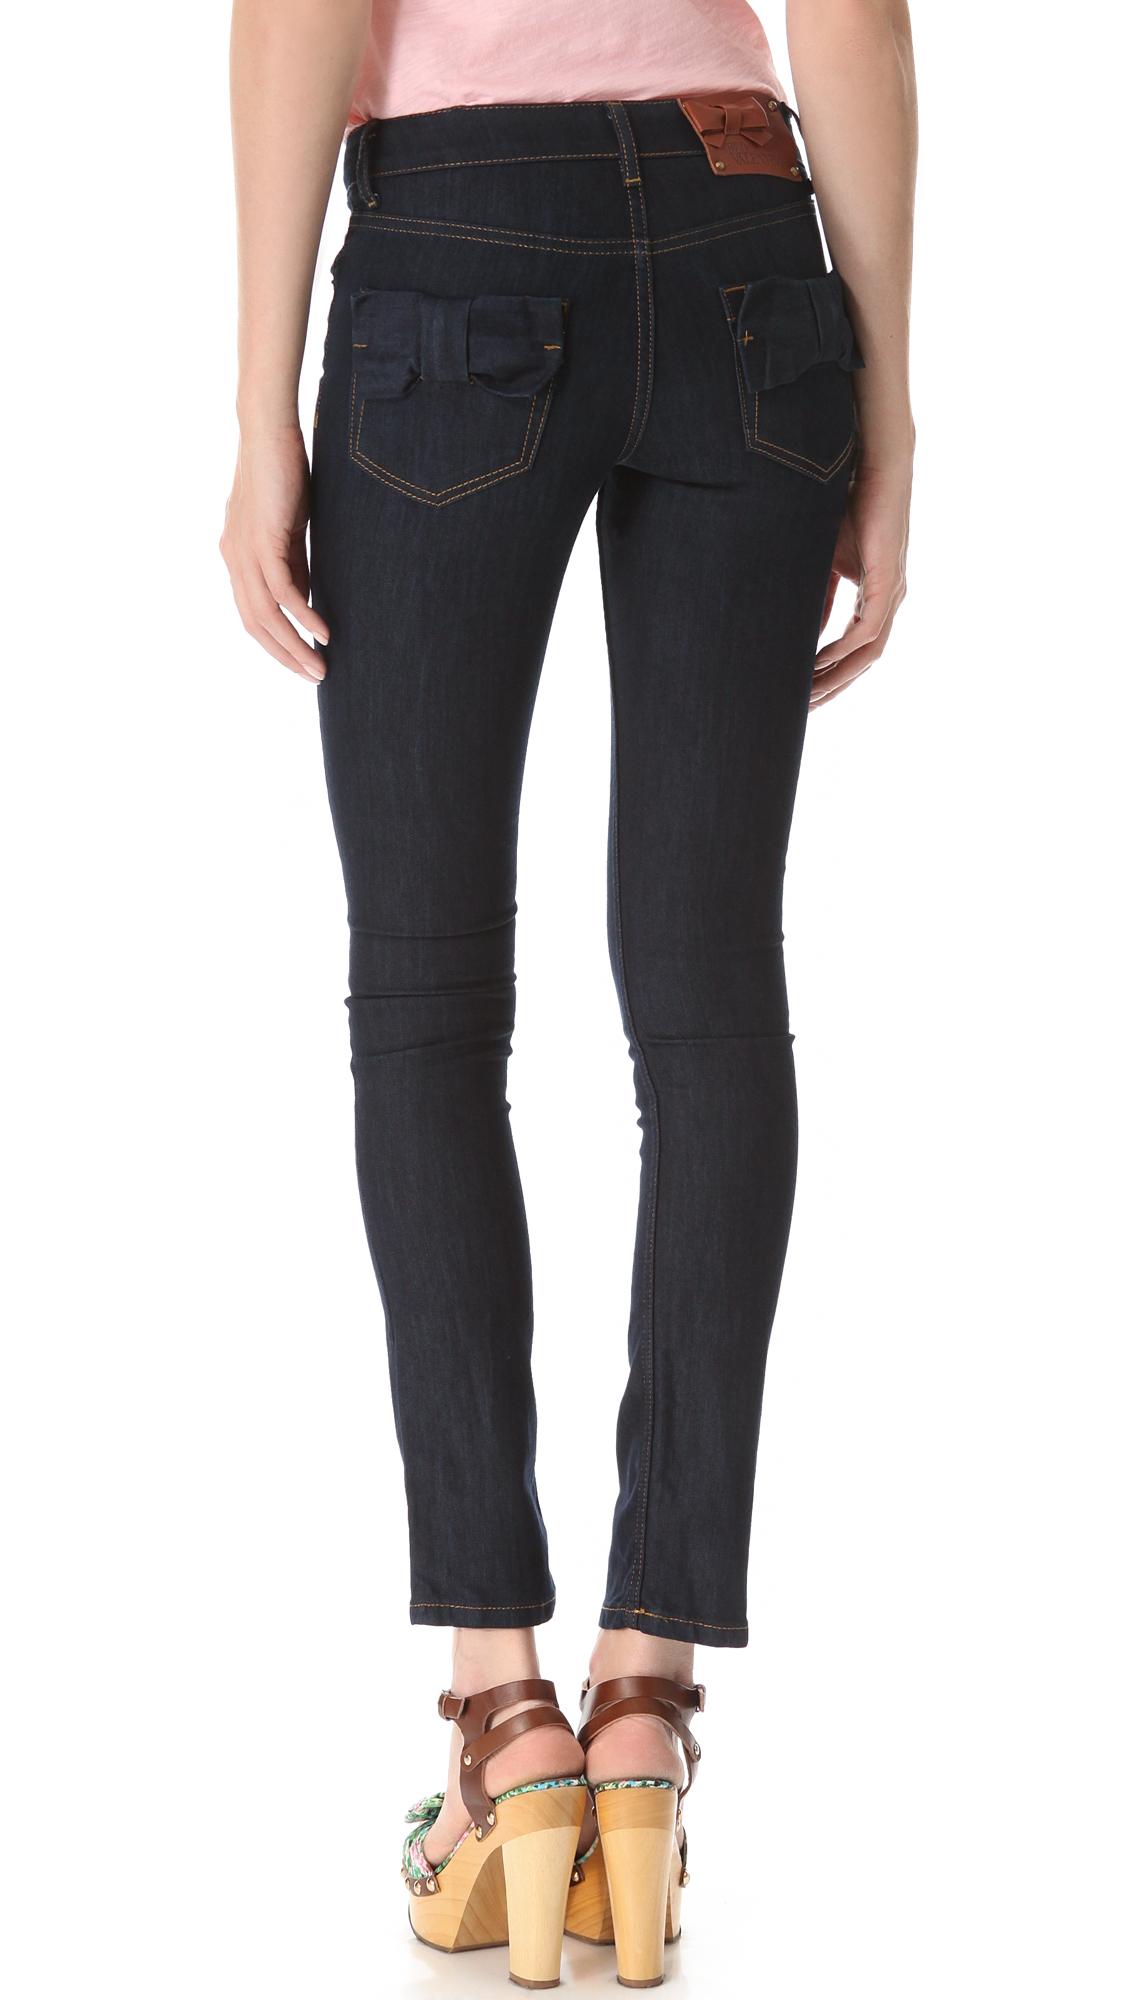 Skinny Stretch Jeans For Women